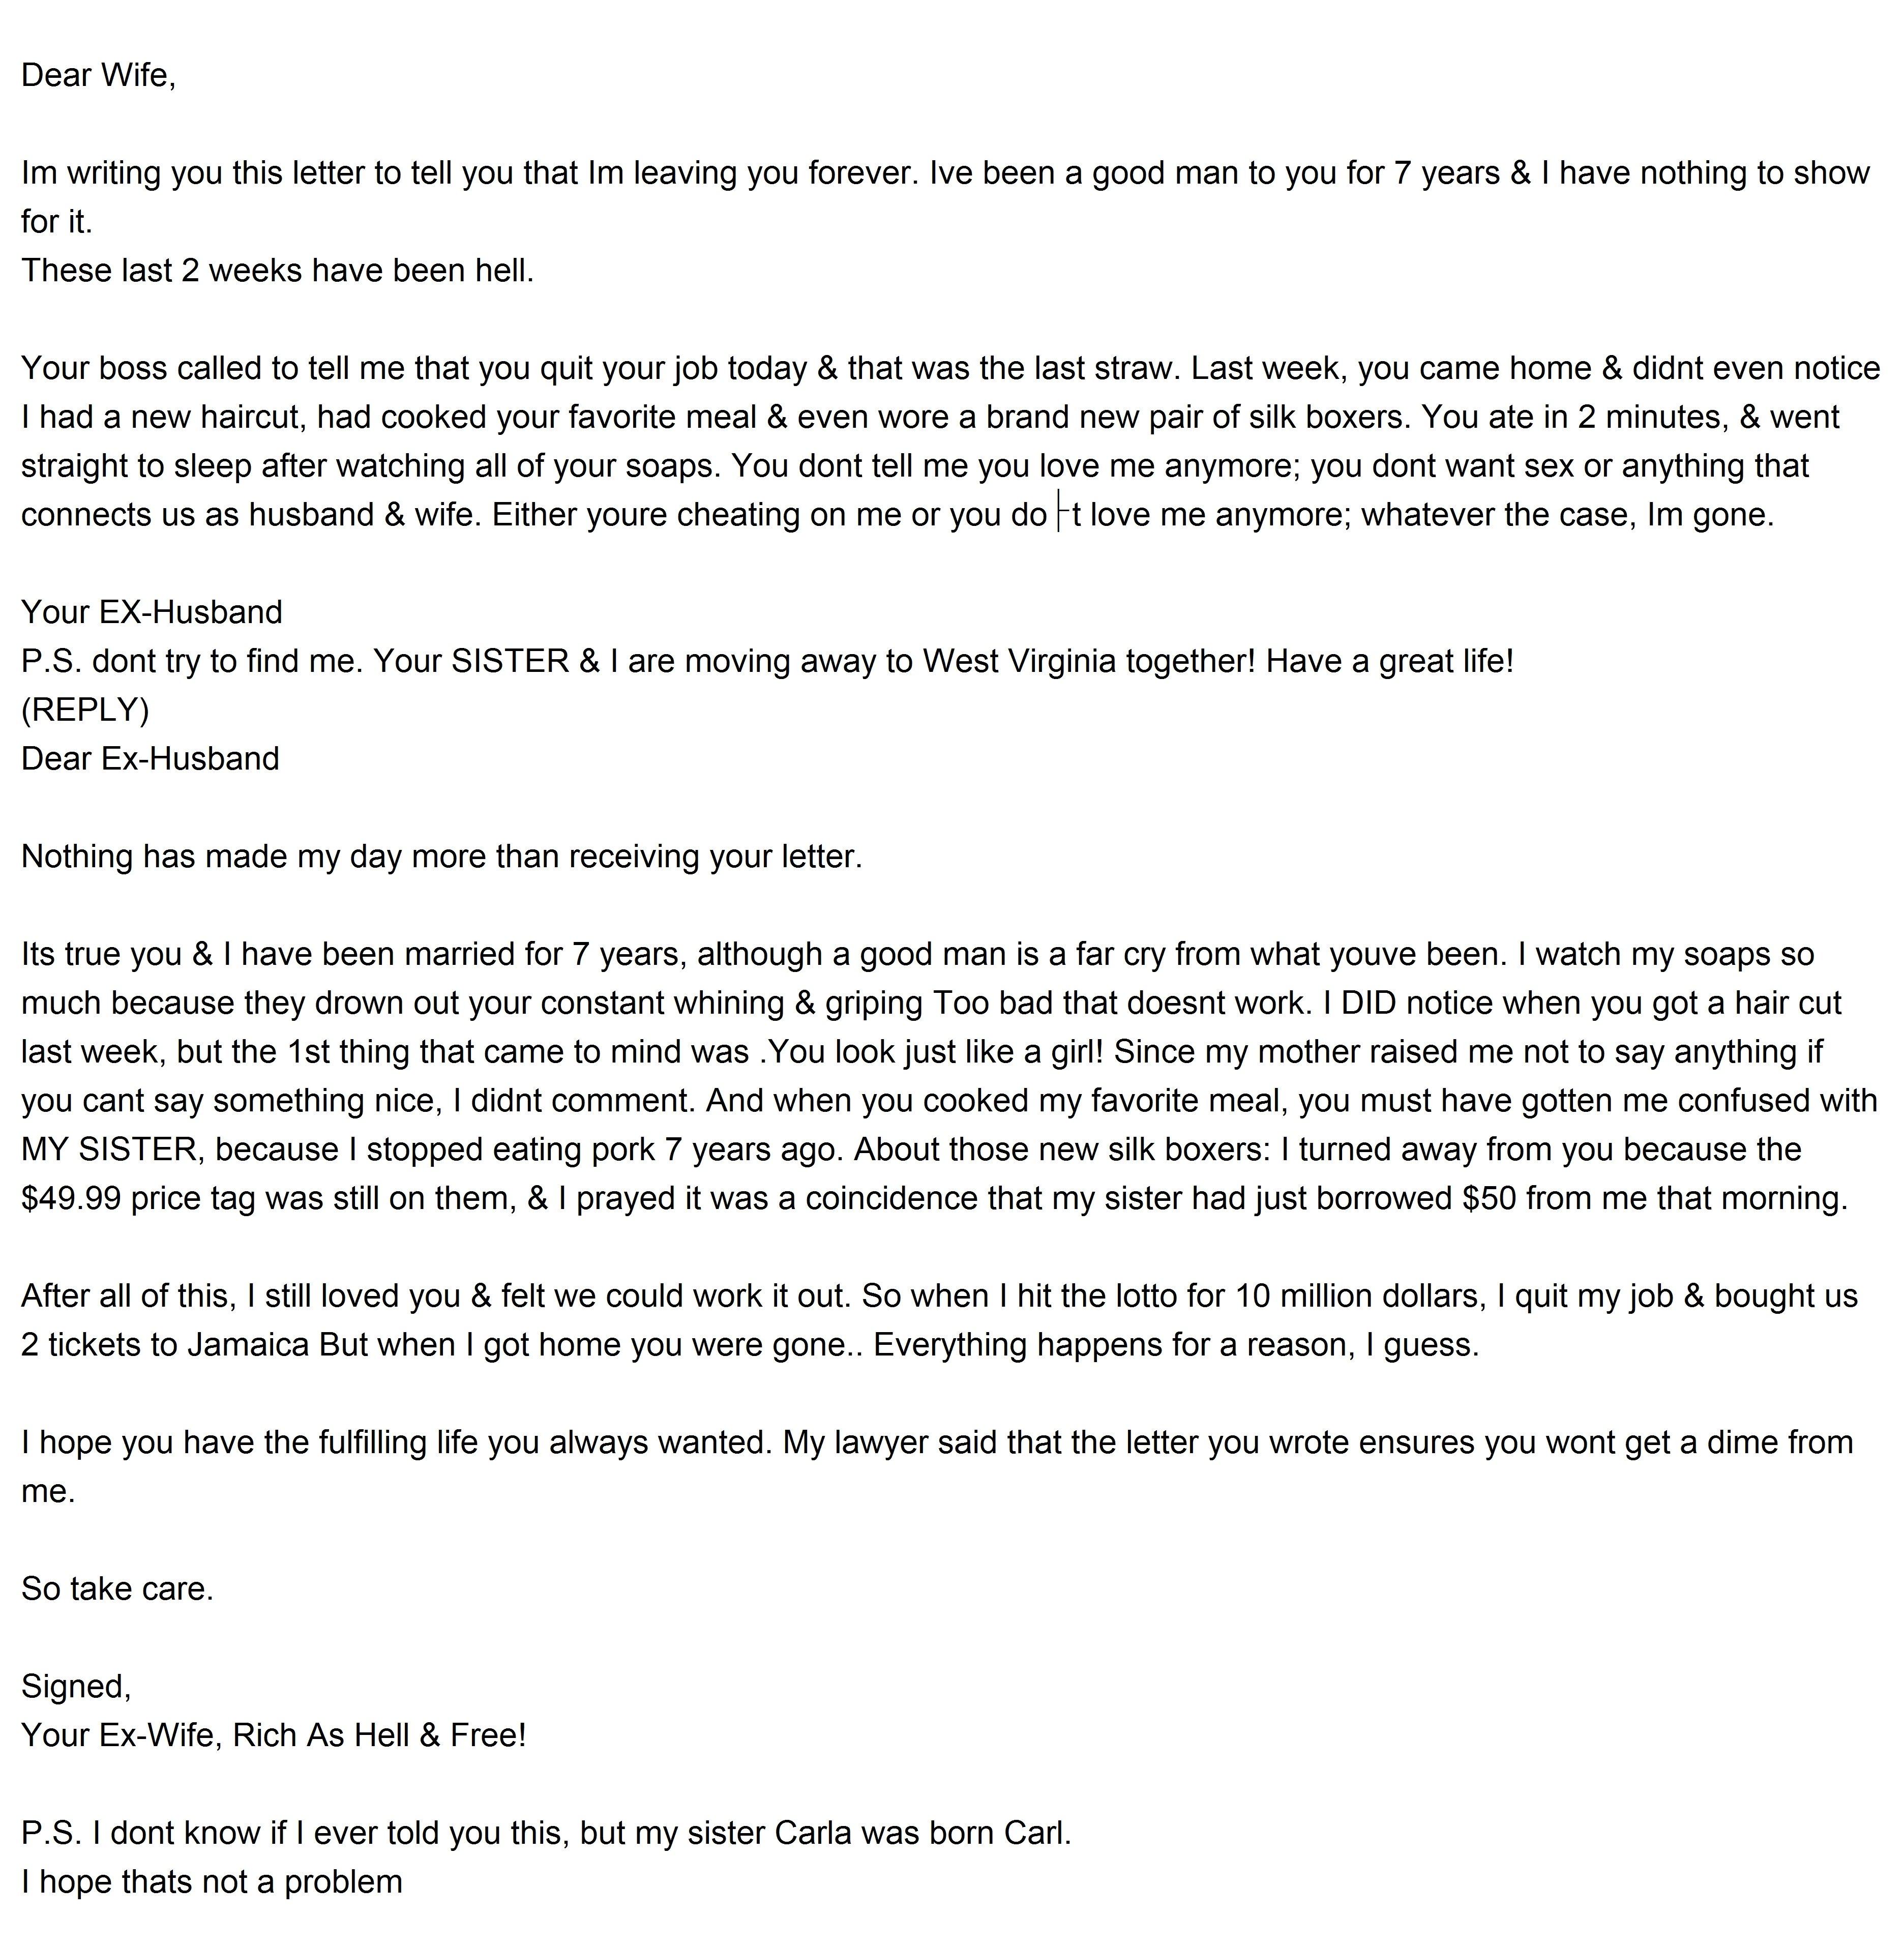 Divorce letter insrenterprises best divorce letter ever solutioingenieria Images